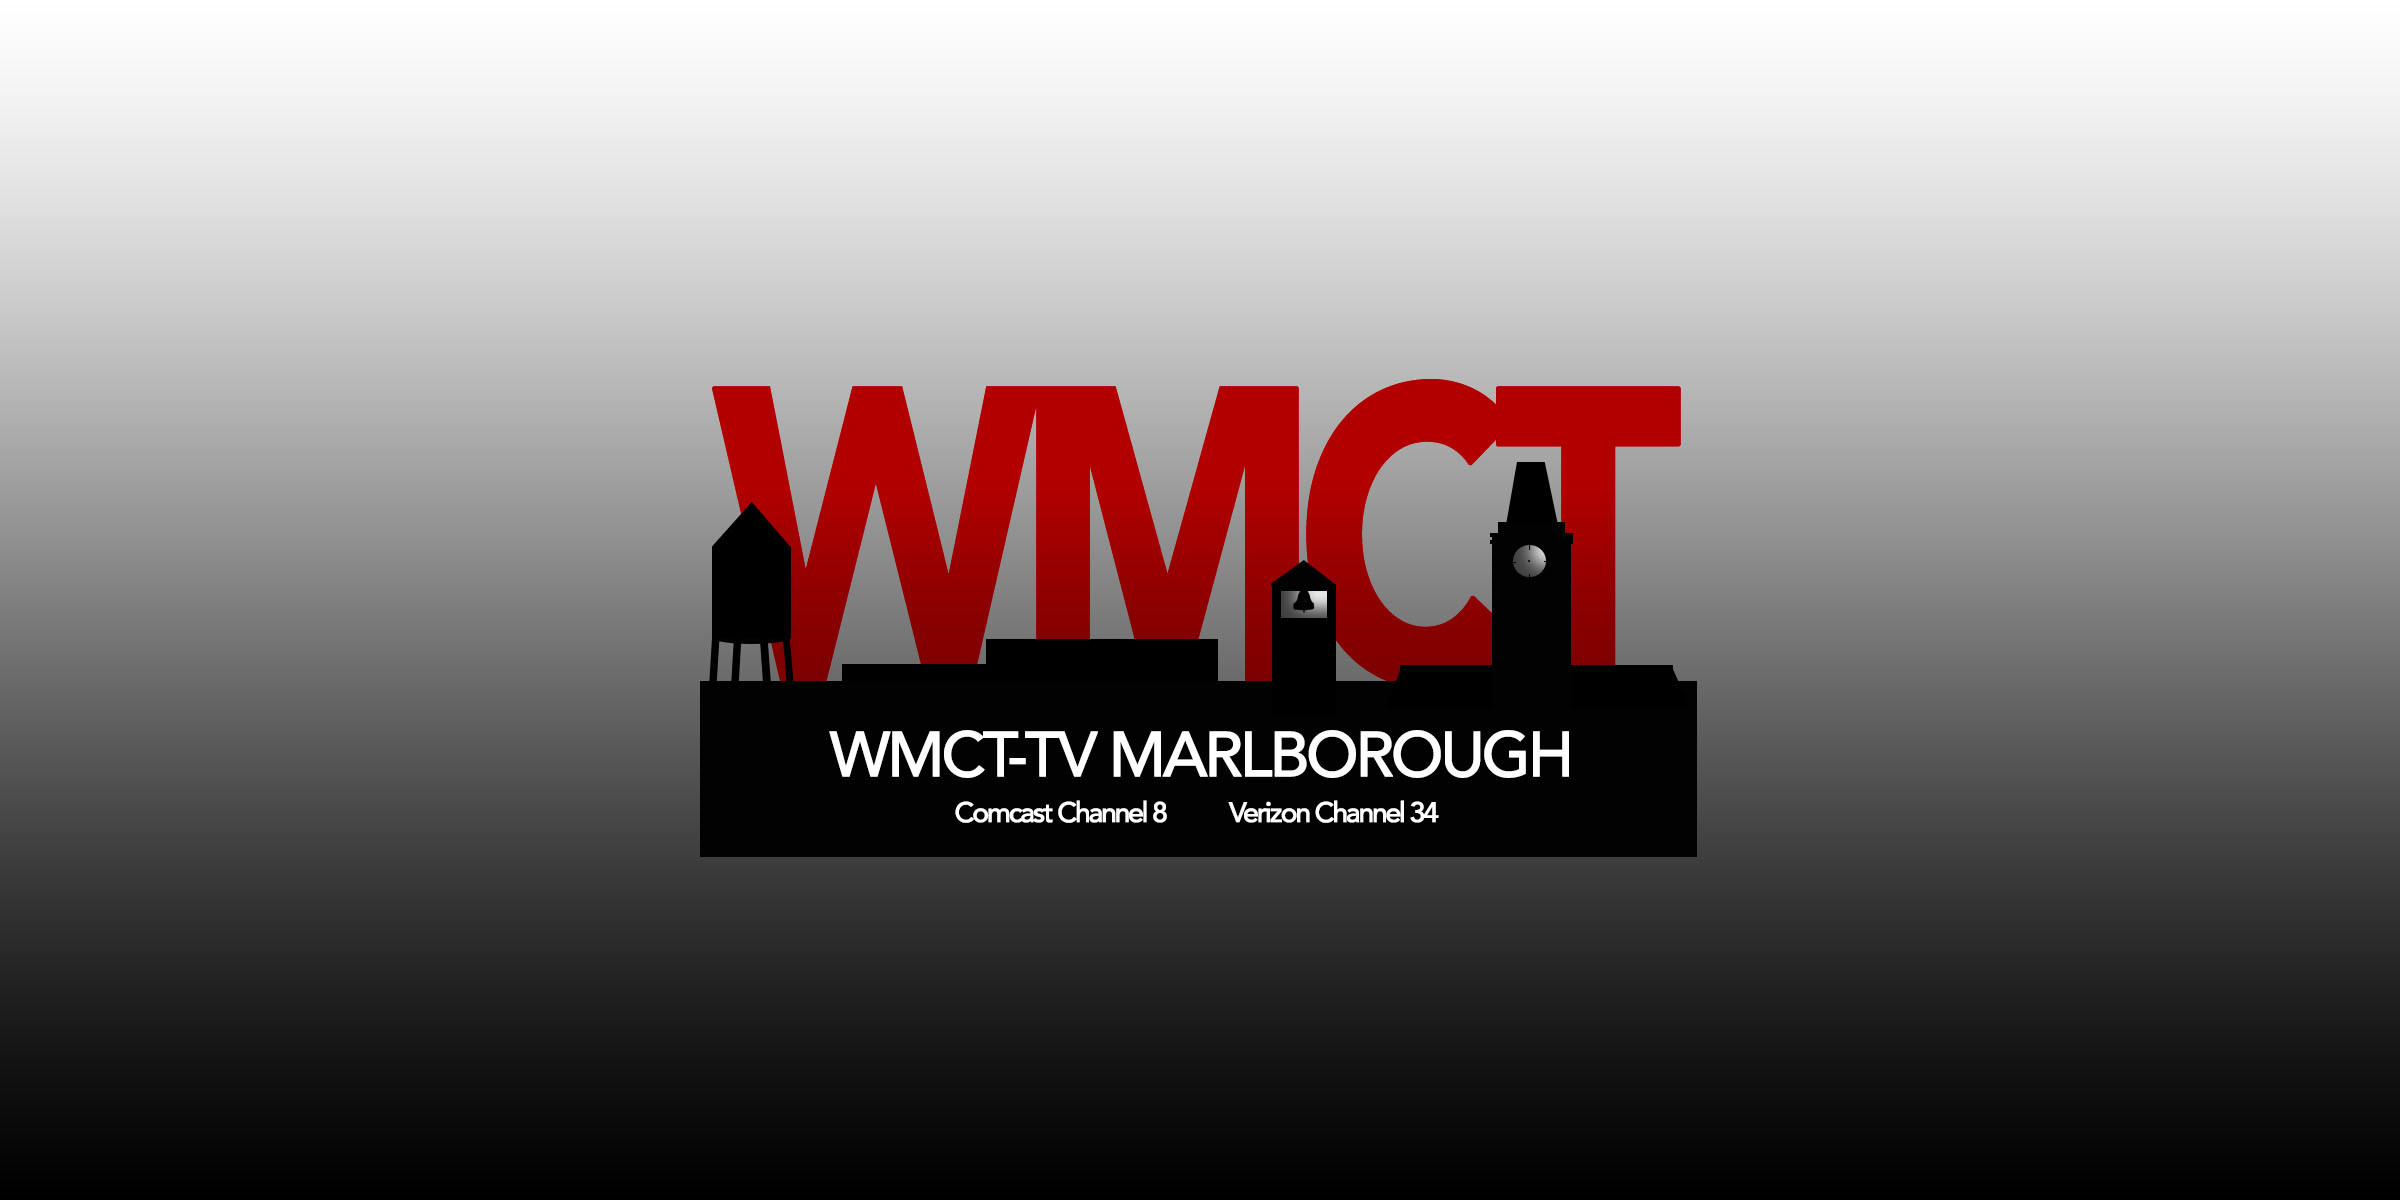 WMCT-TV